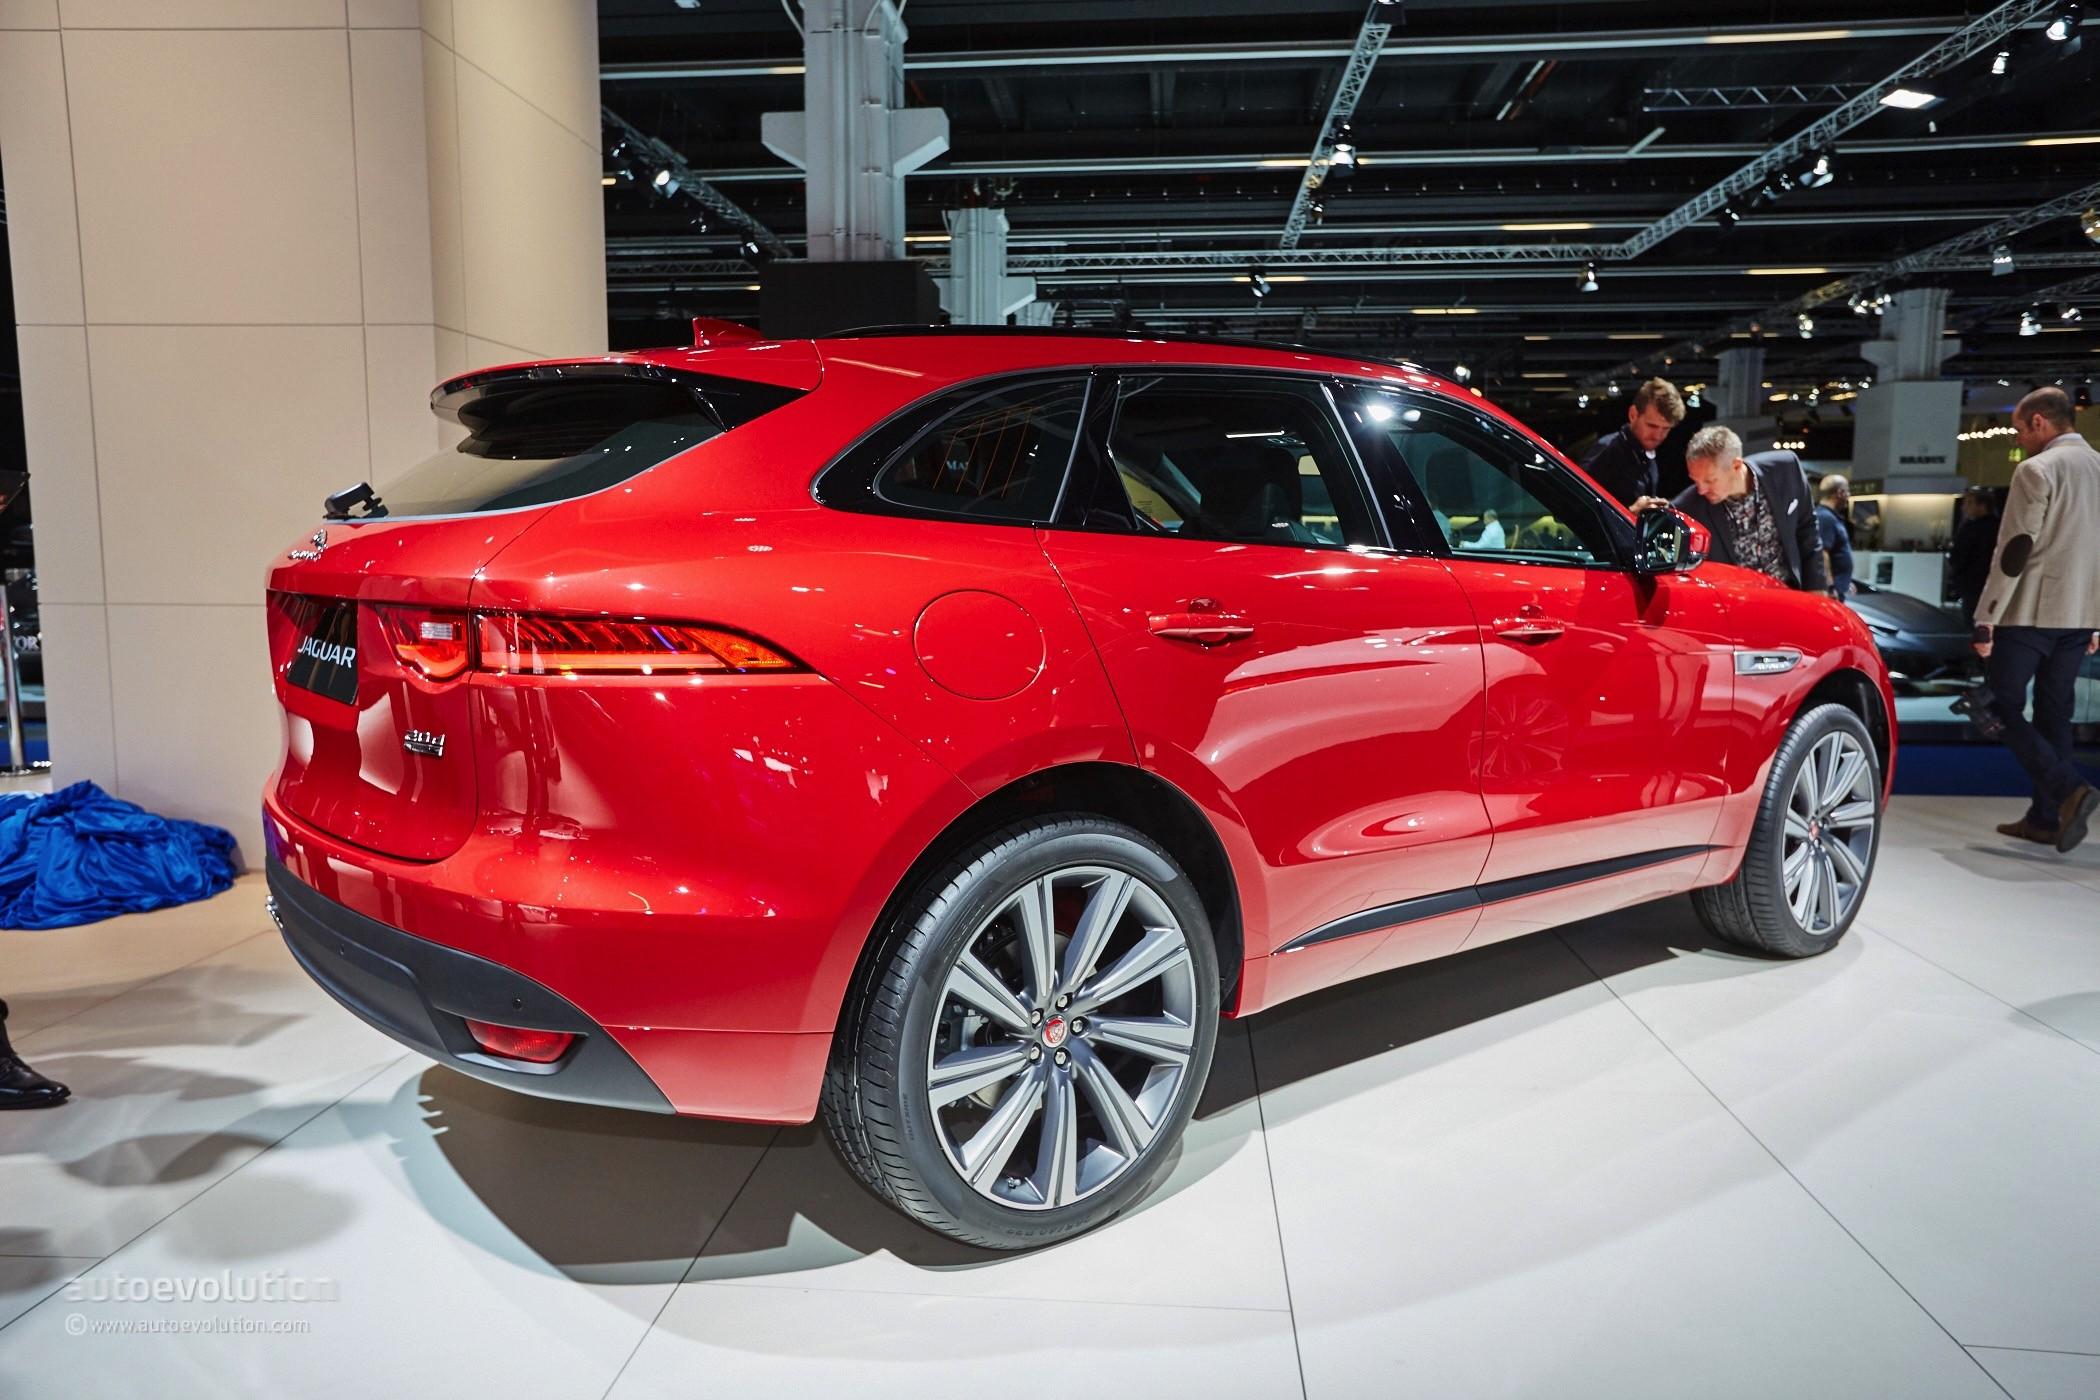 2016 Jaguar F-Pace Looks Massive in the Metal on the Frankfurt Motor Show Floor - autoevolution